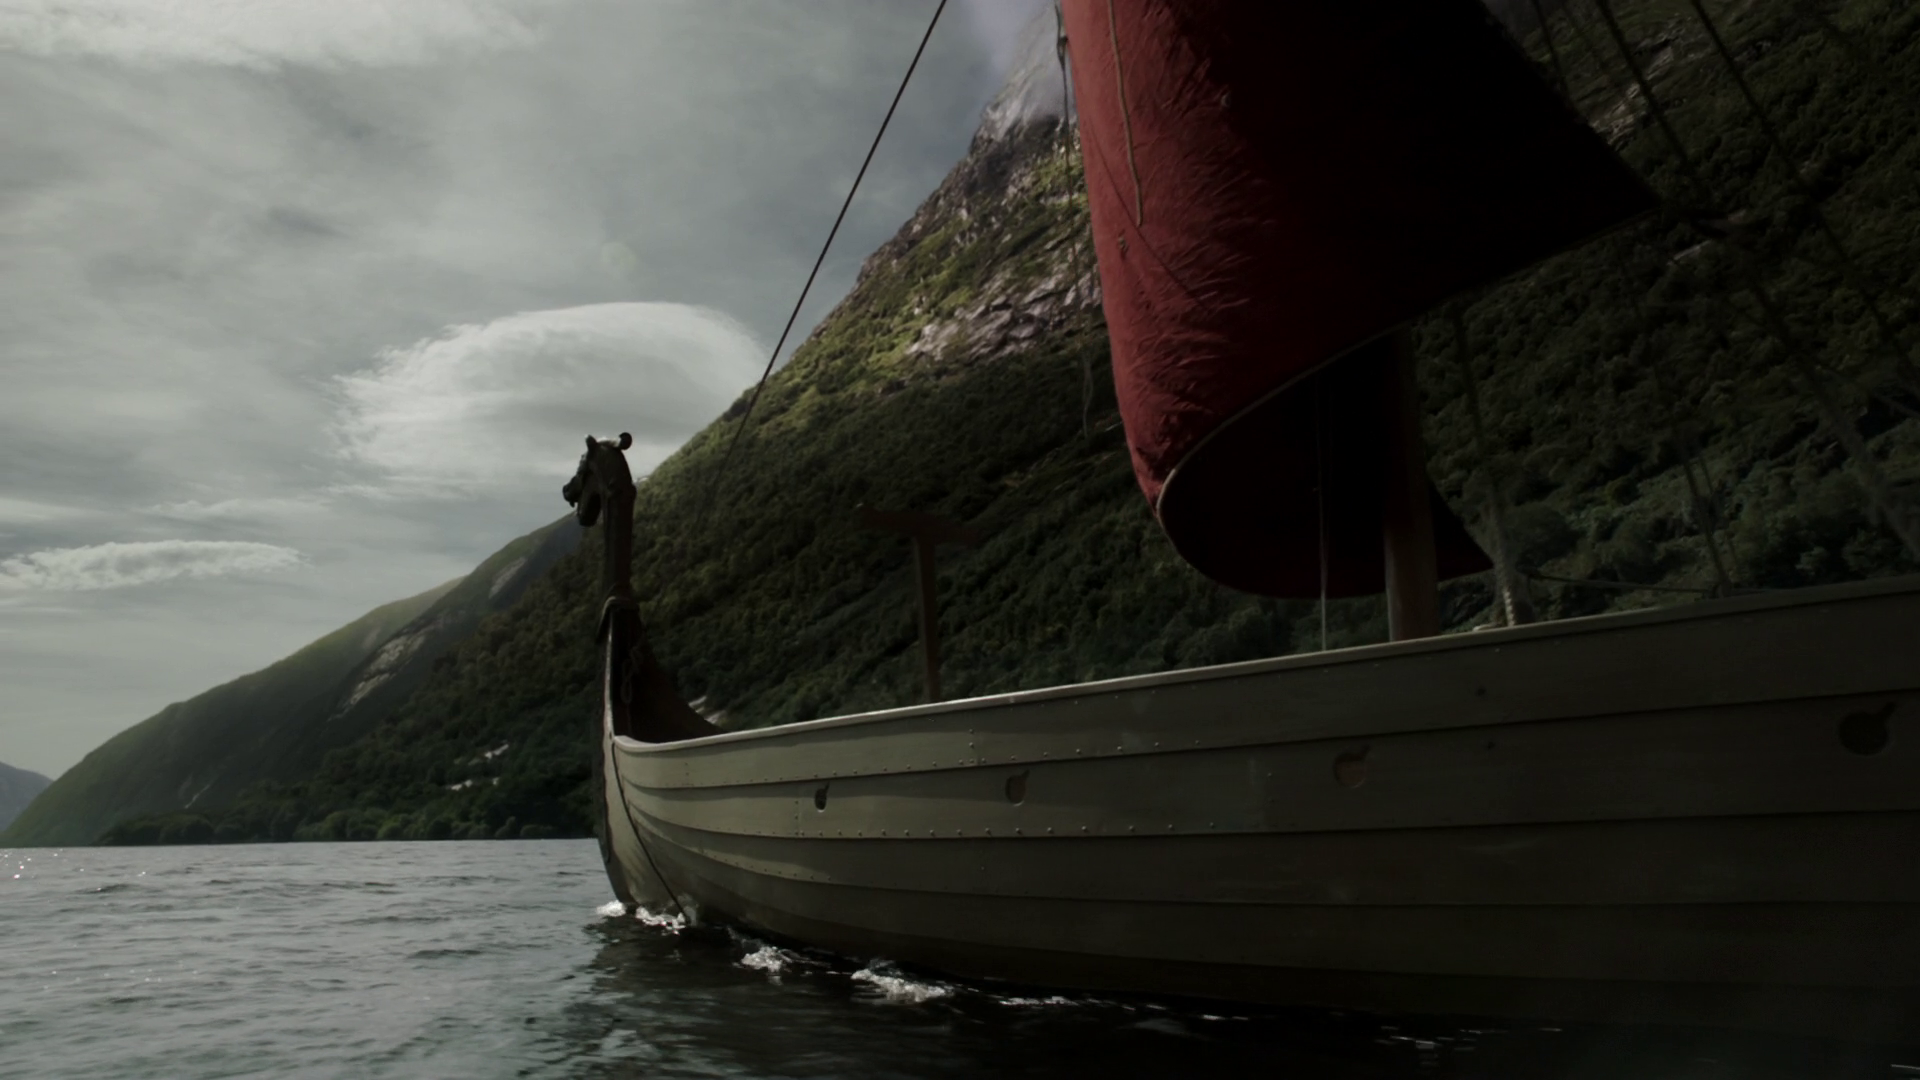 Vikings Wallpaper History Channel Tv reviews vikings episode 1 1920x1080